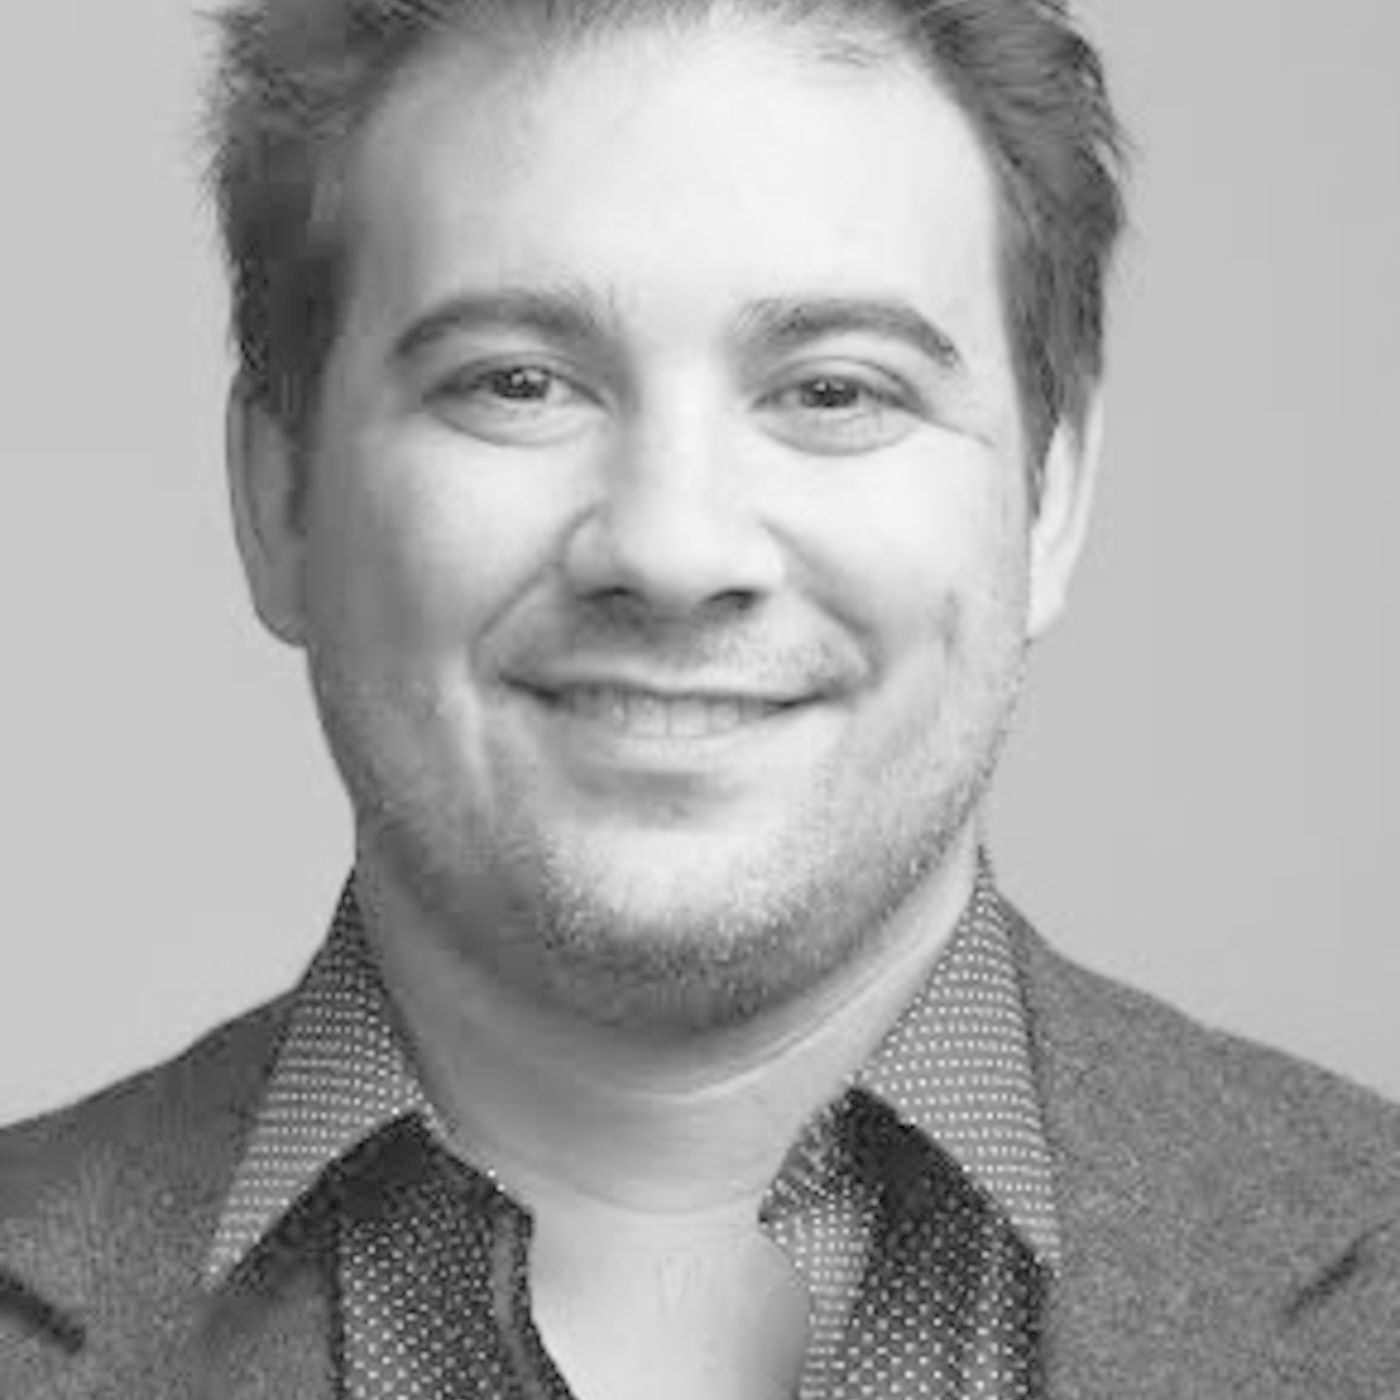 Lee Daniel Kravetz Co-Author of SUPERSURVIVORS: The Surprising Link Between Suffering and Success_Dec. 6th, 2014